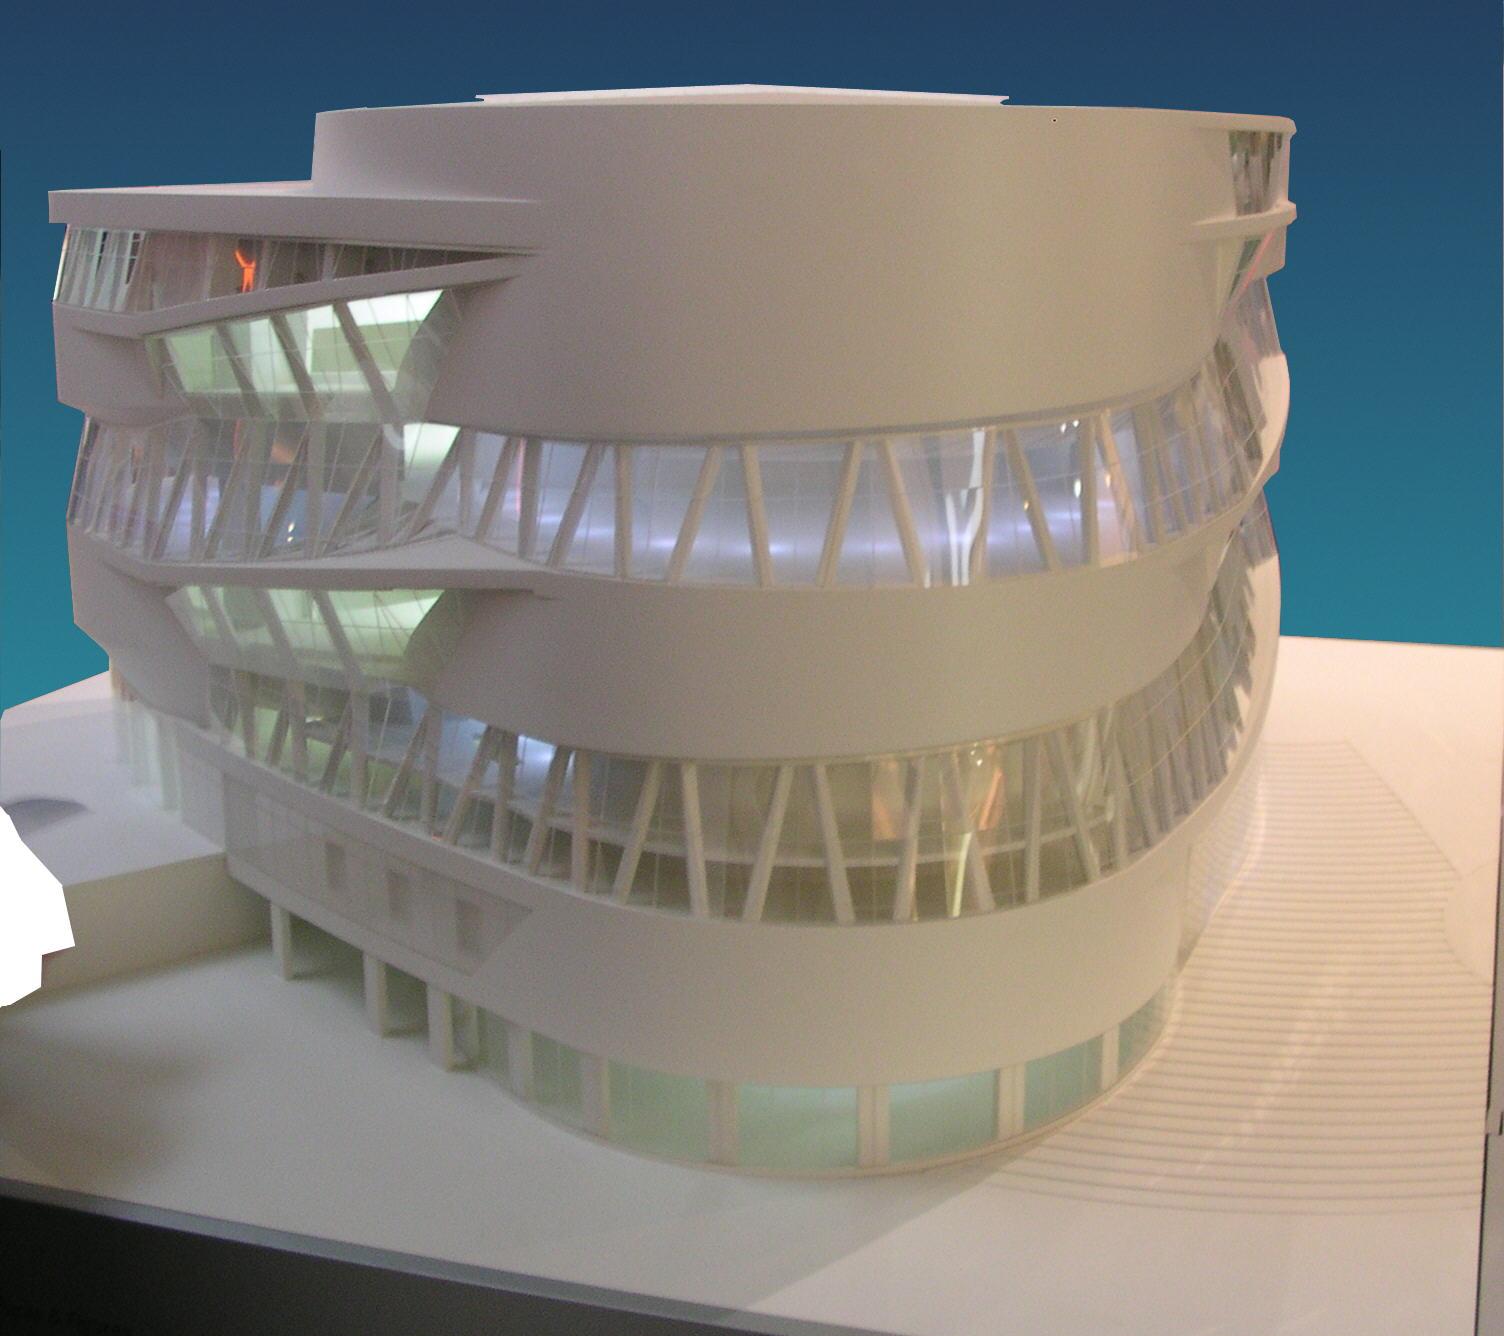 Modell Architektur | Datei Mercedes Museum Modell 3 Jpg Wikipedia